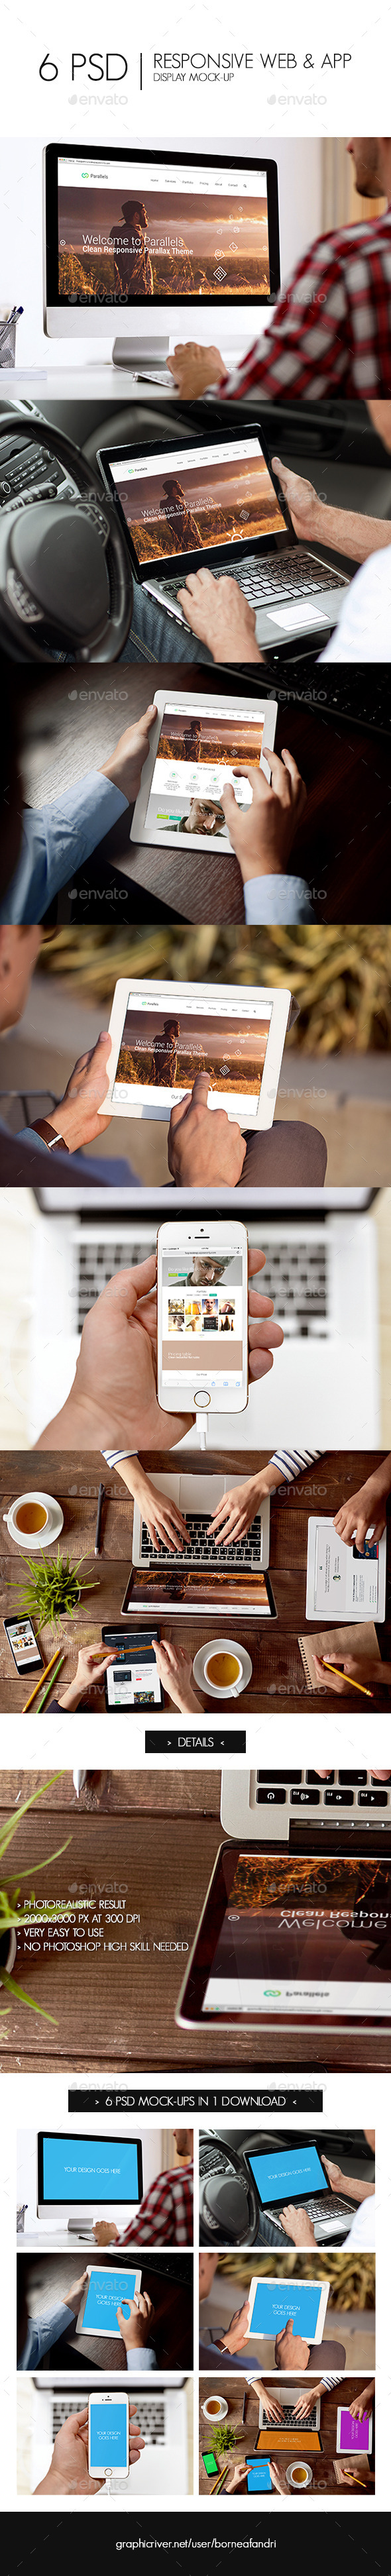 GraphicRiver Responsive Web & App Display Mock-Up 11190848